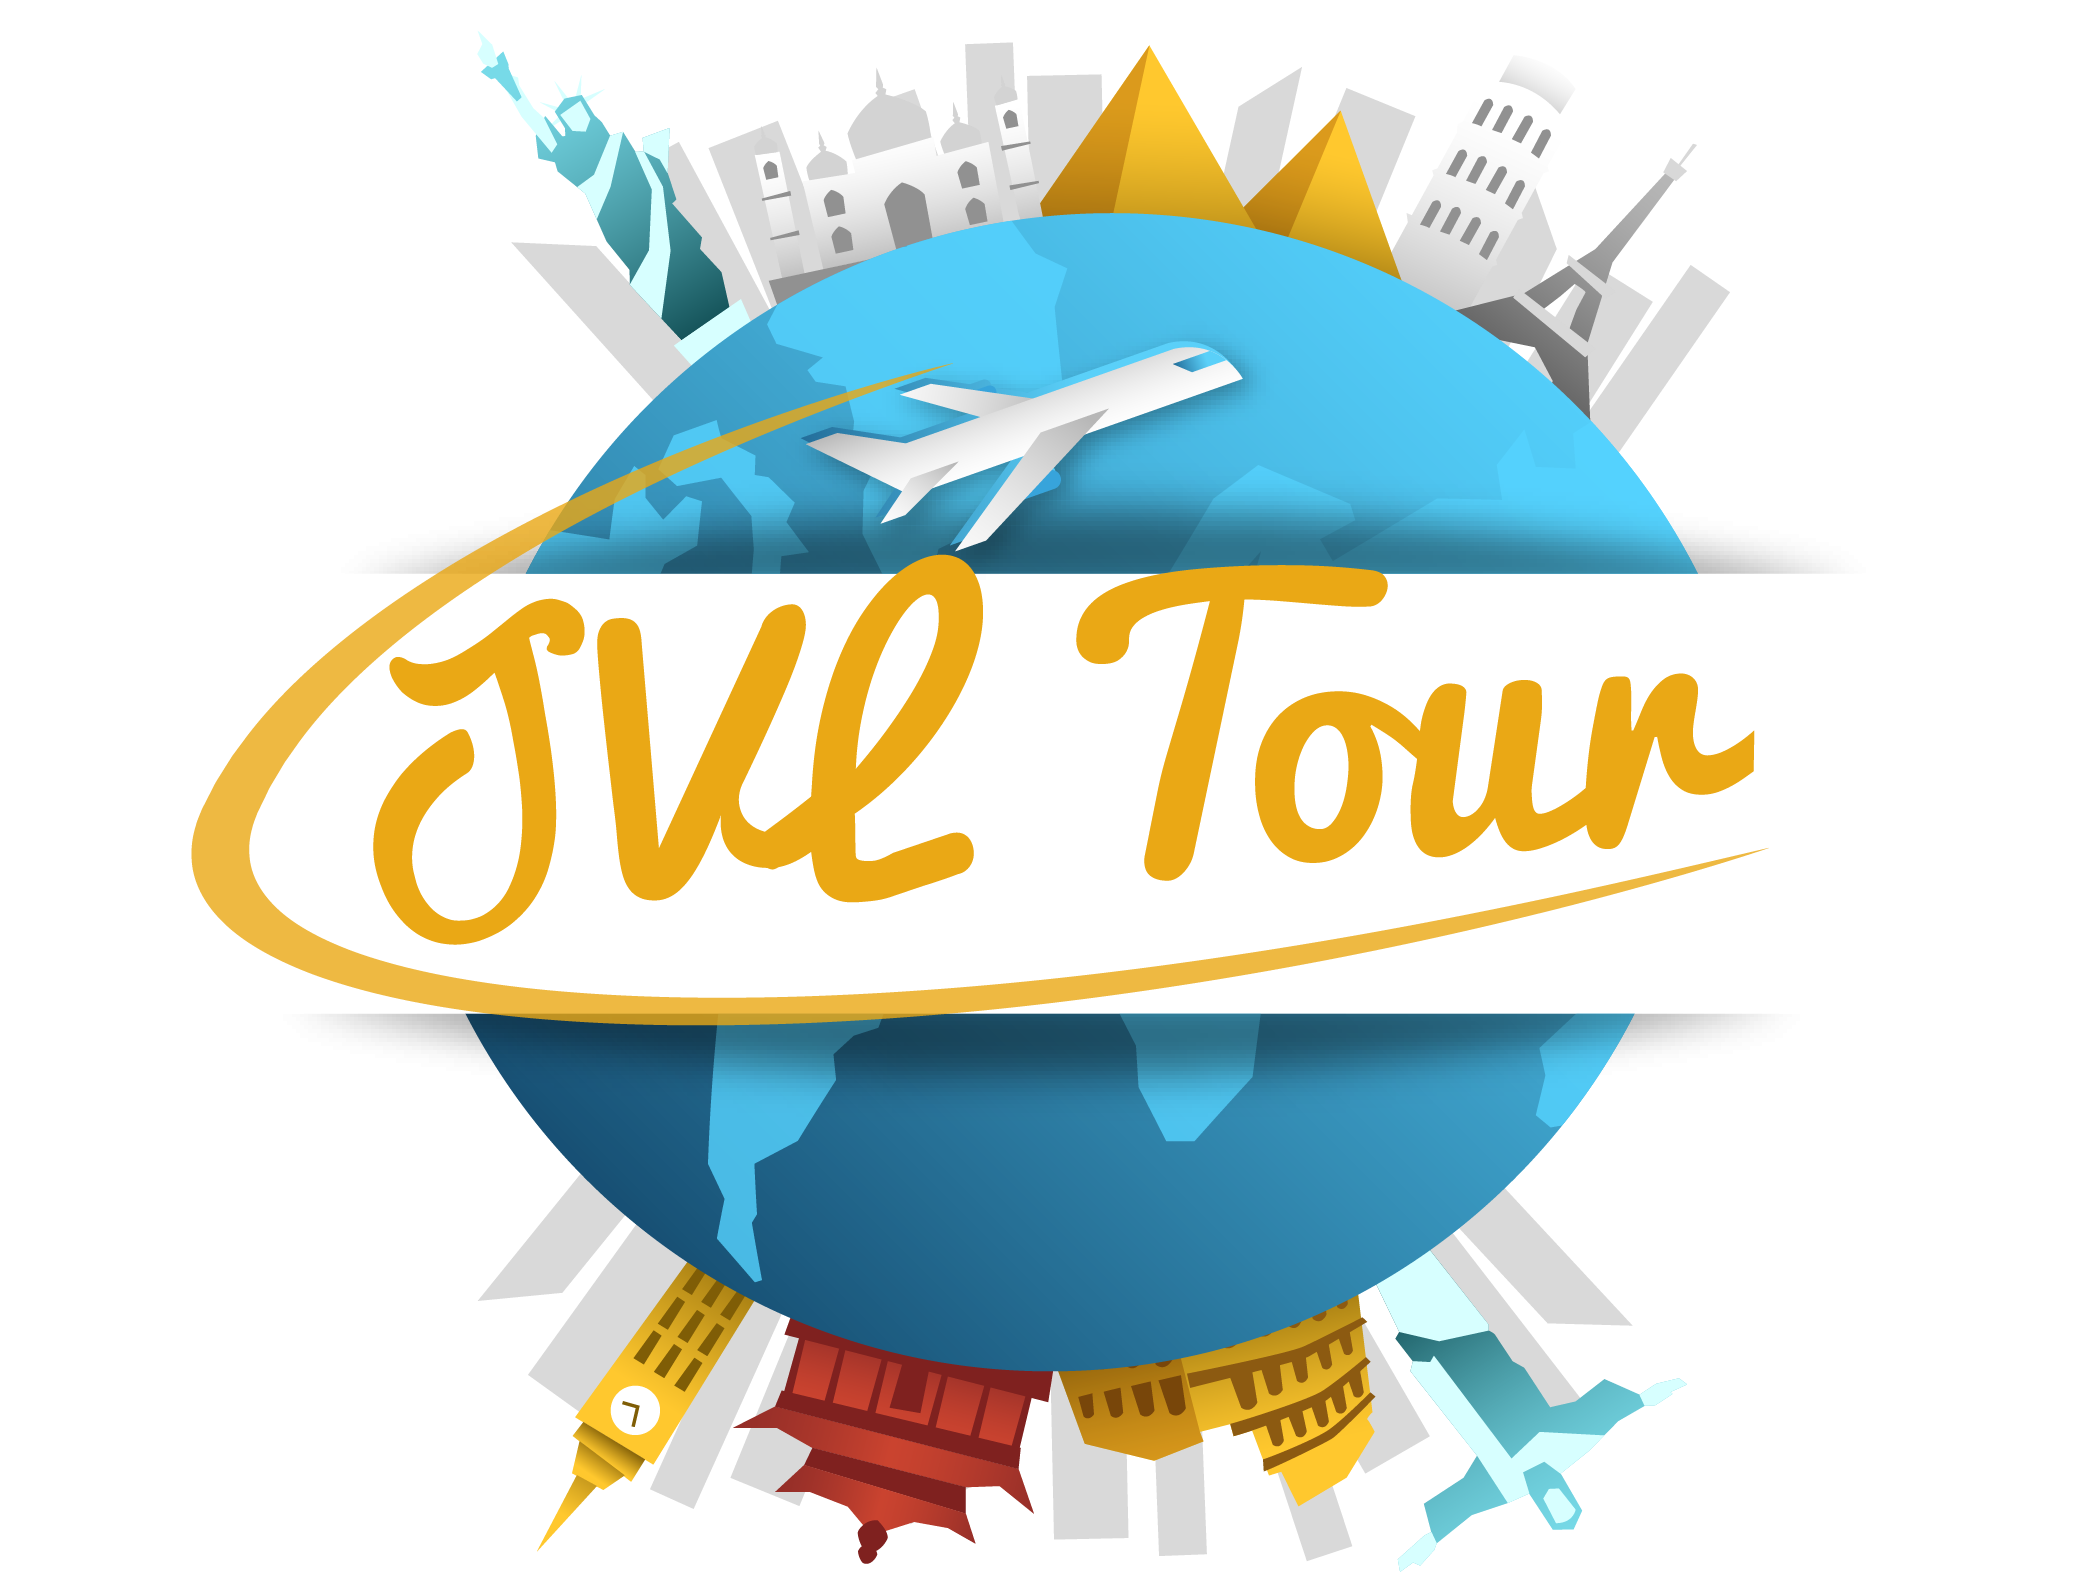 JVL TOUR